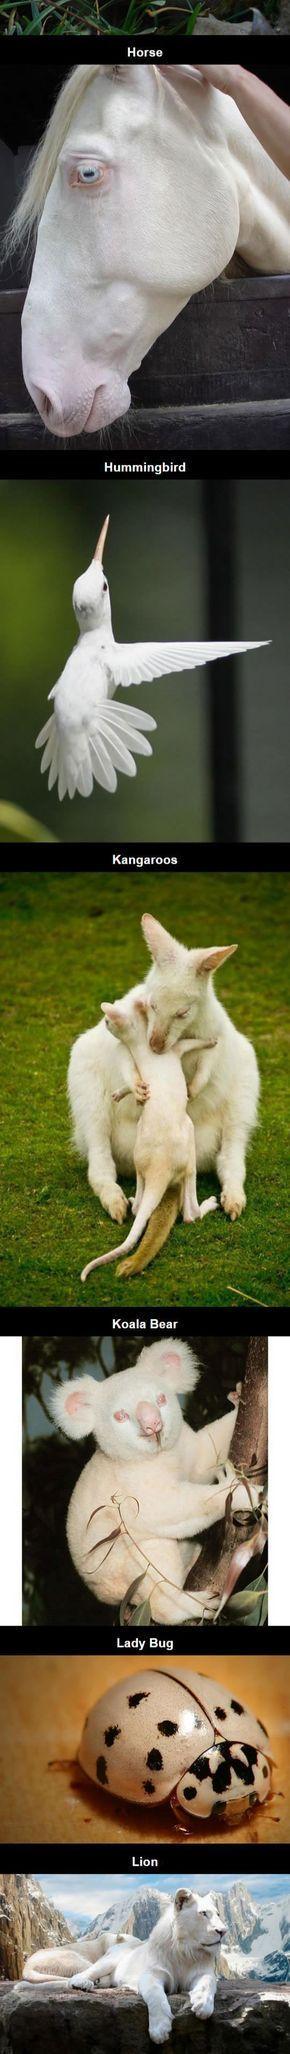 17 Rare Albino Animals,  #Albino #albinoanimalhorses #animals #Rare #albinoanimals